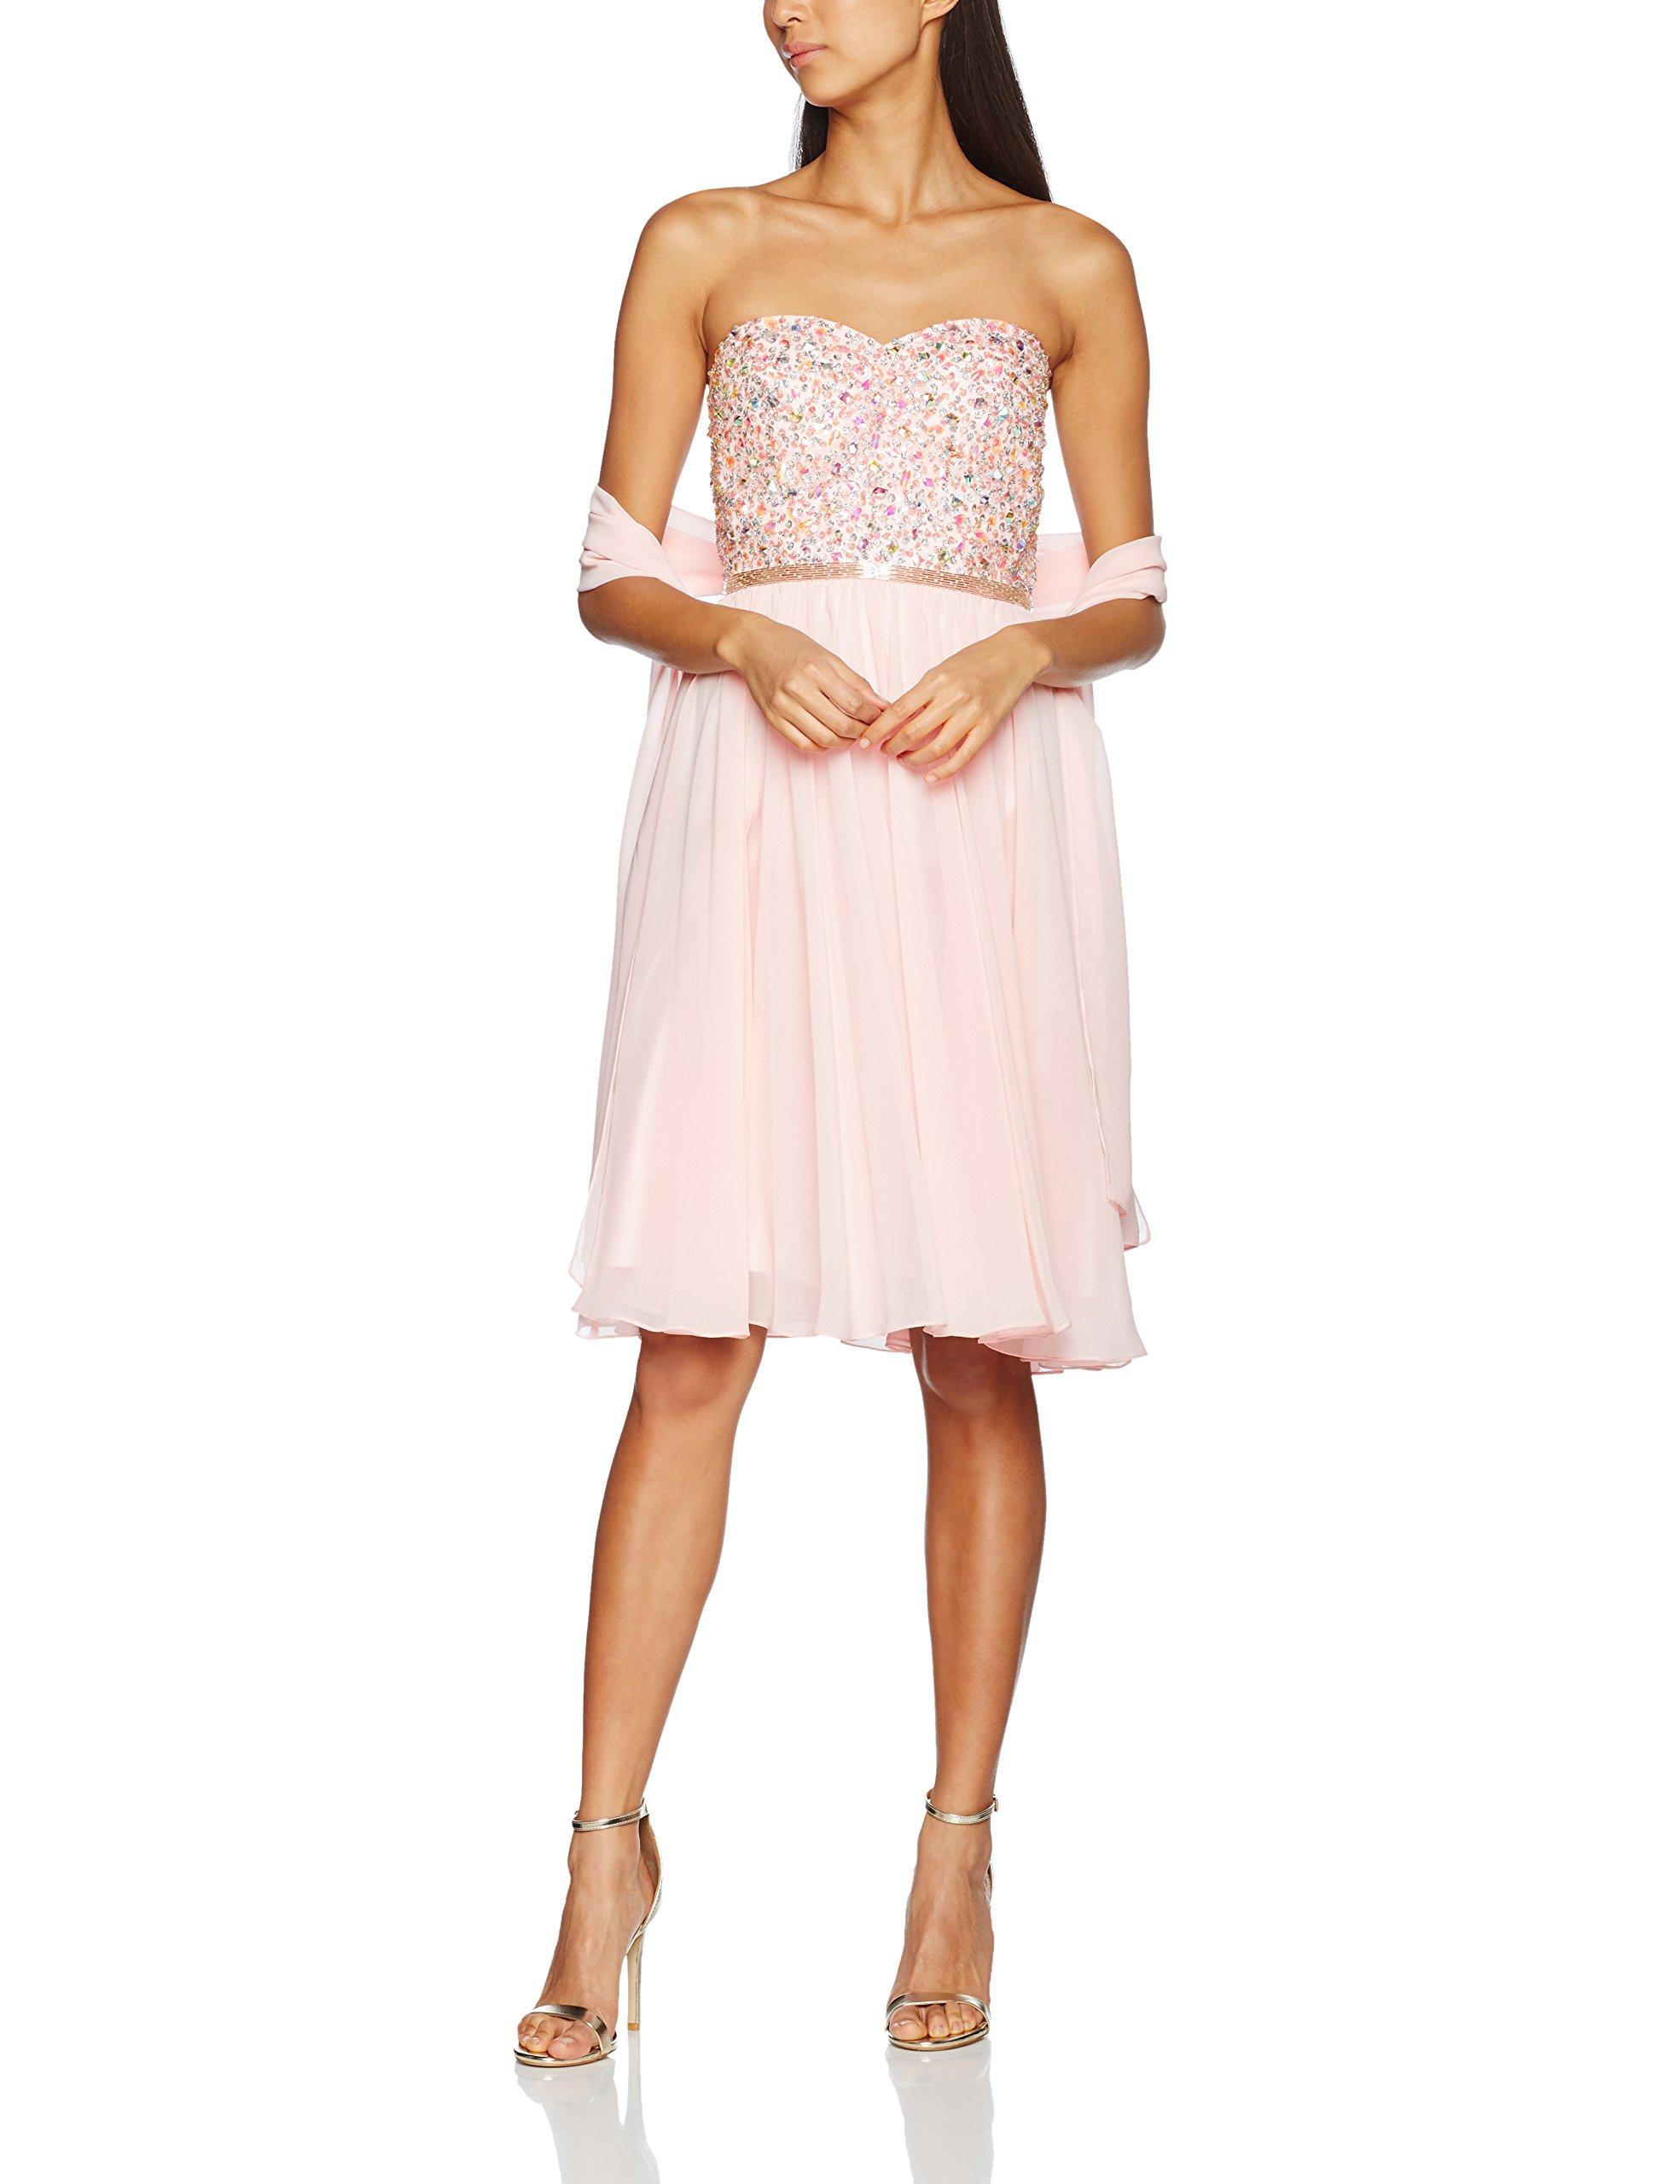 De Soirée Pinkalmond S heartRobe Beaded Femme Pink42 Mascara 9IHWYDE2